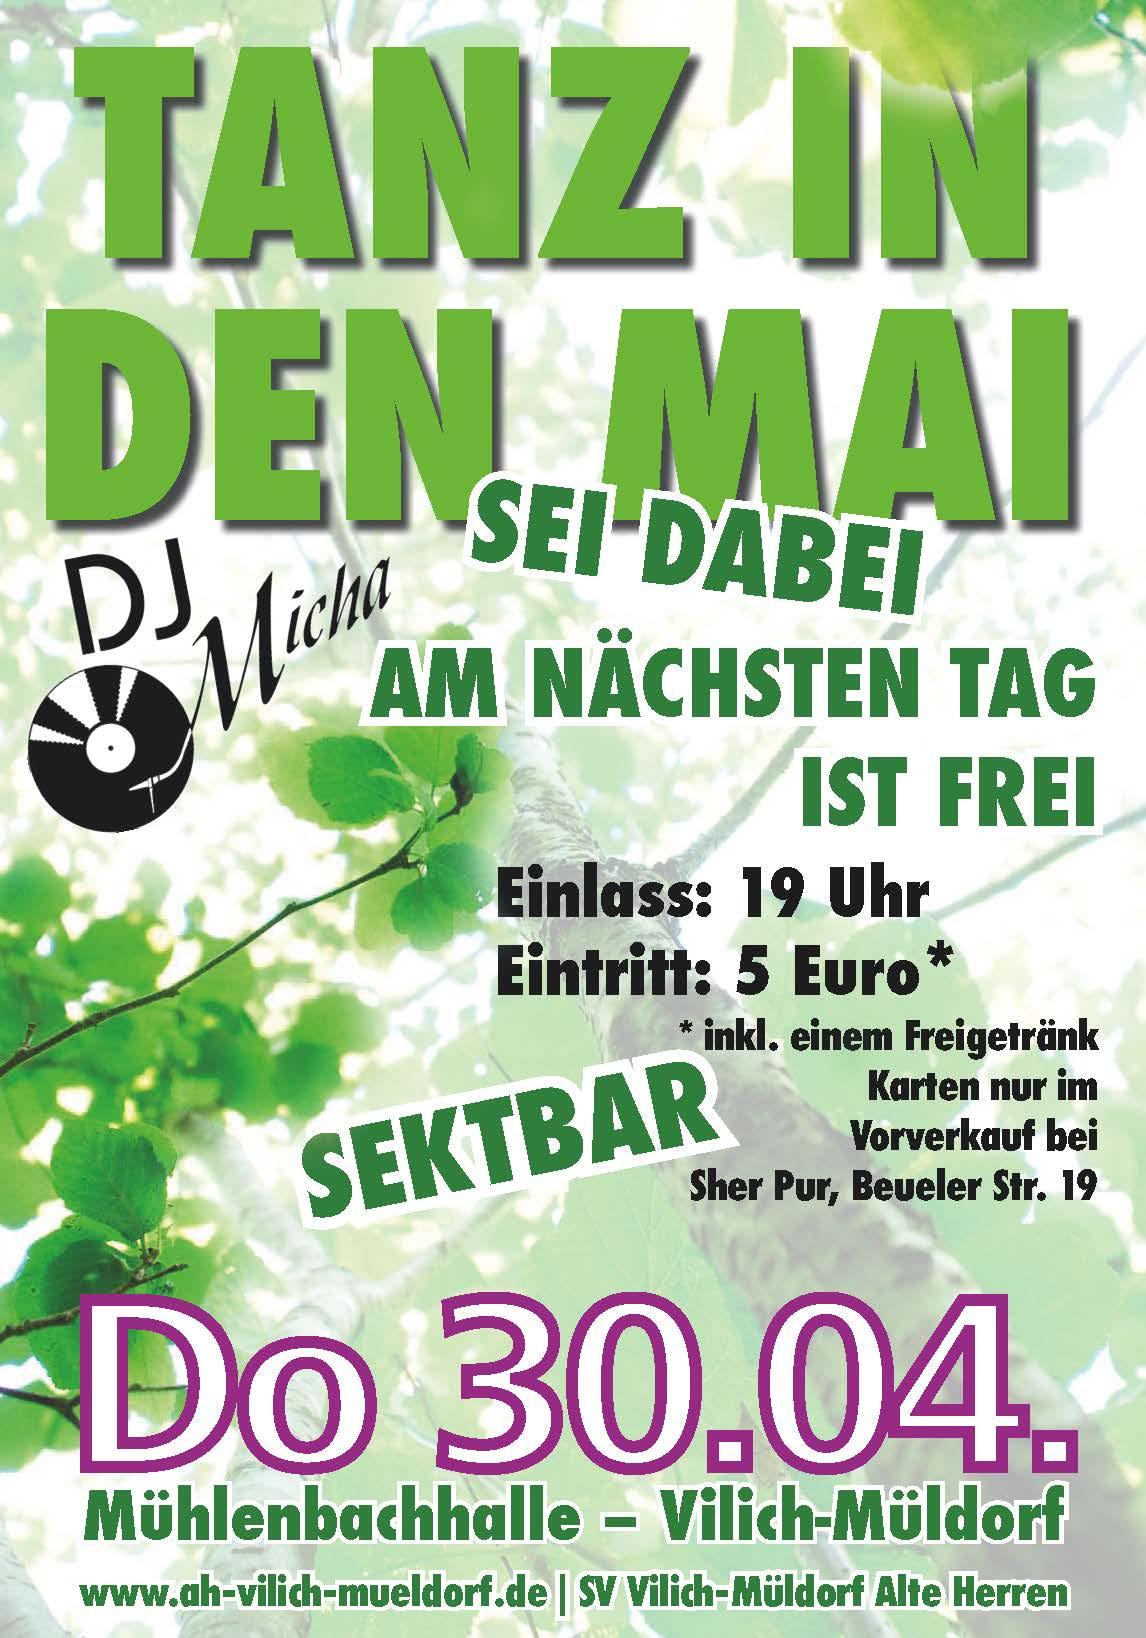 Tanz_in_den_Mai_2015_Flyer